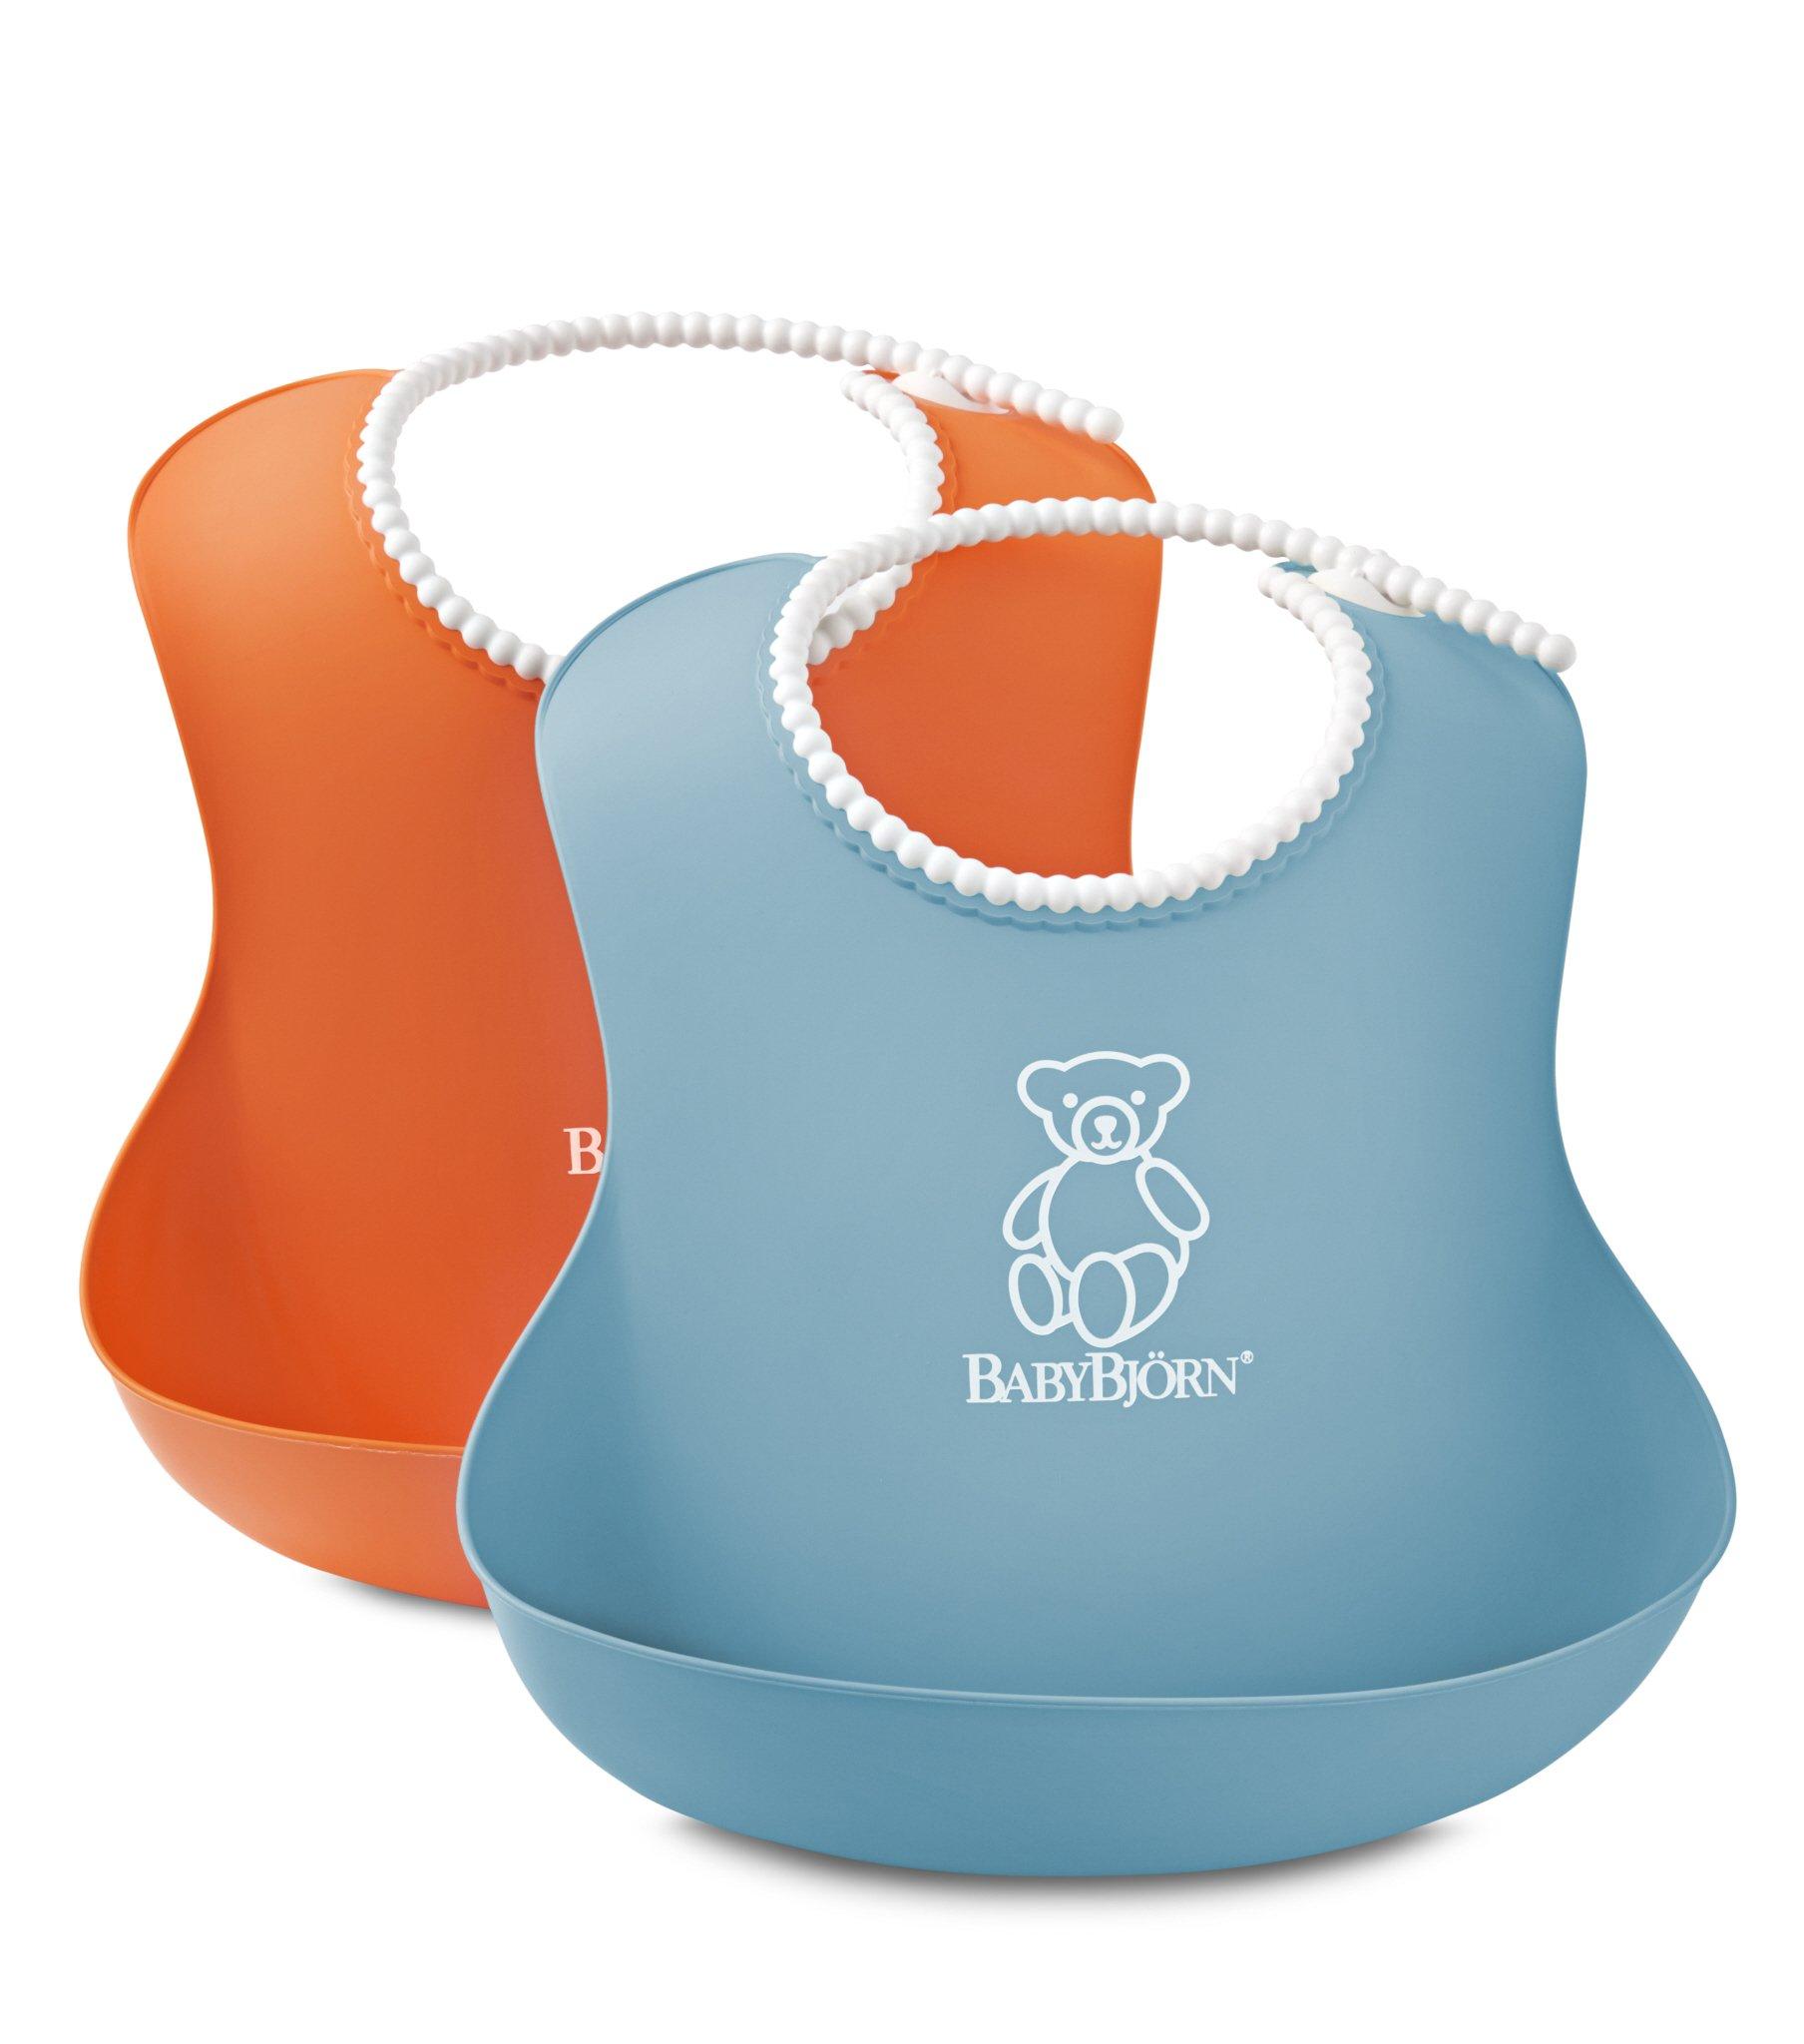 BABYBJORN Soft Bib, Orange/Turquoise, 2 Pack